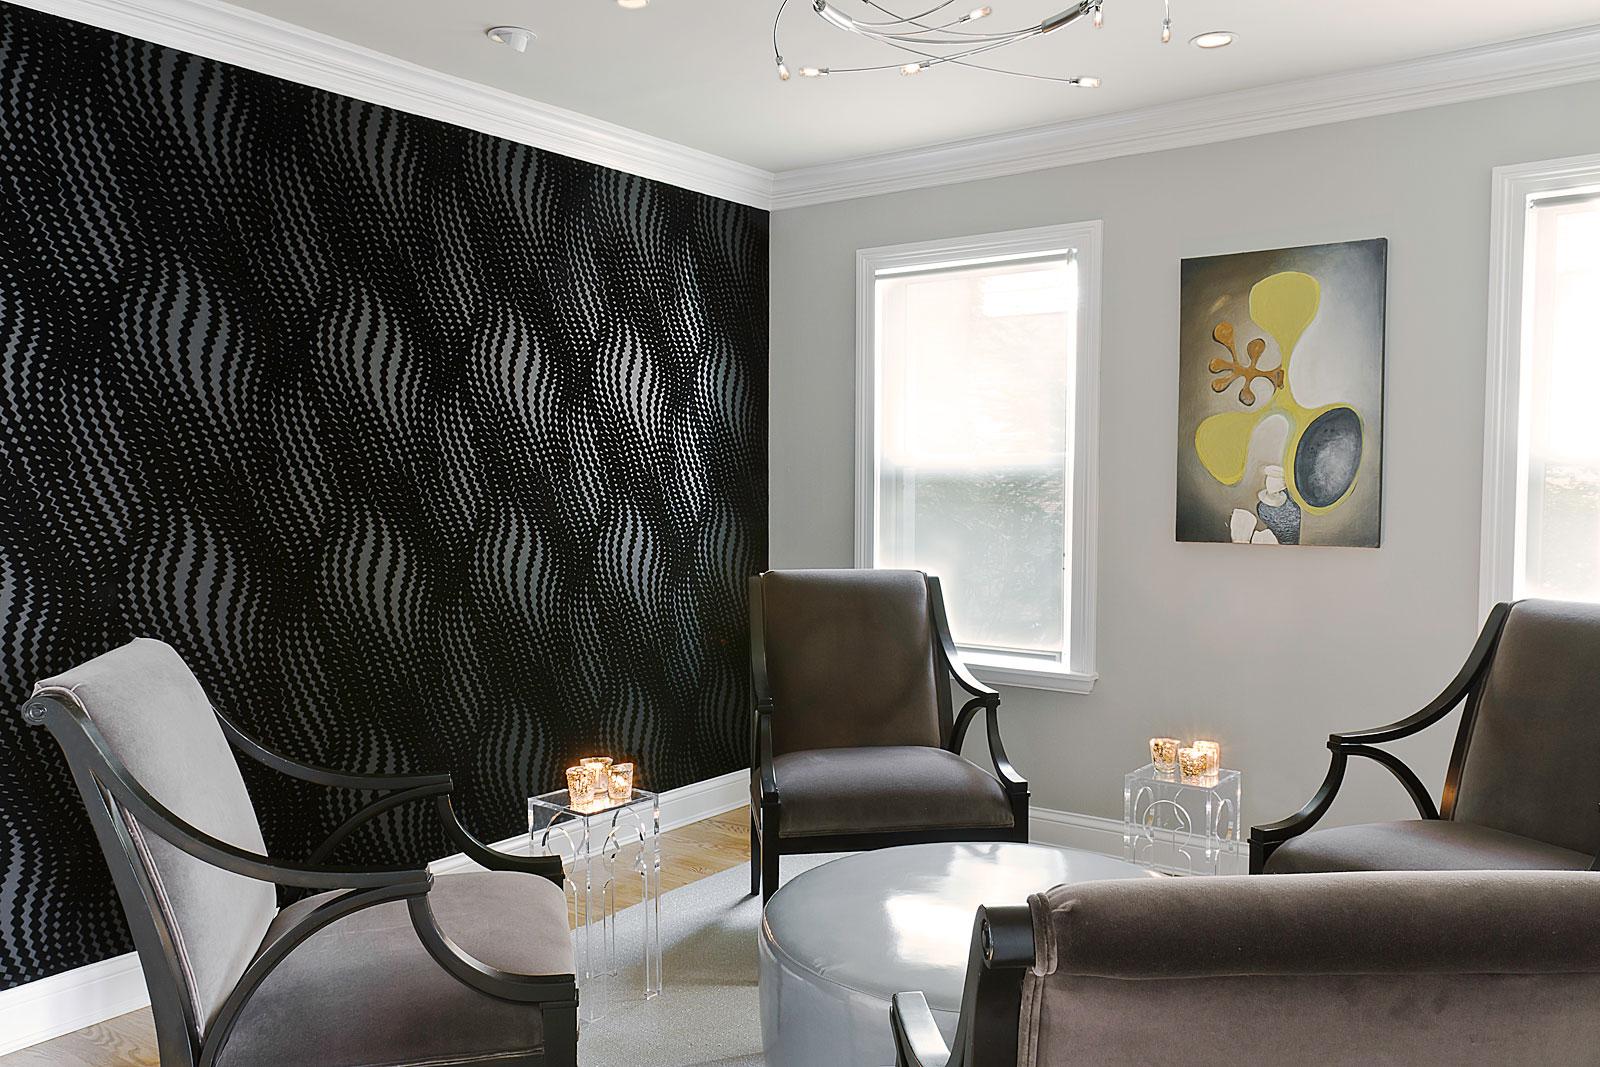 Sitting-room-3-walls164-Edit.jpg